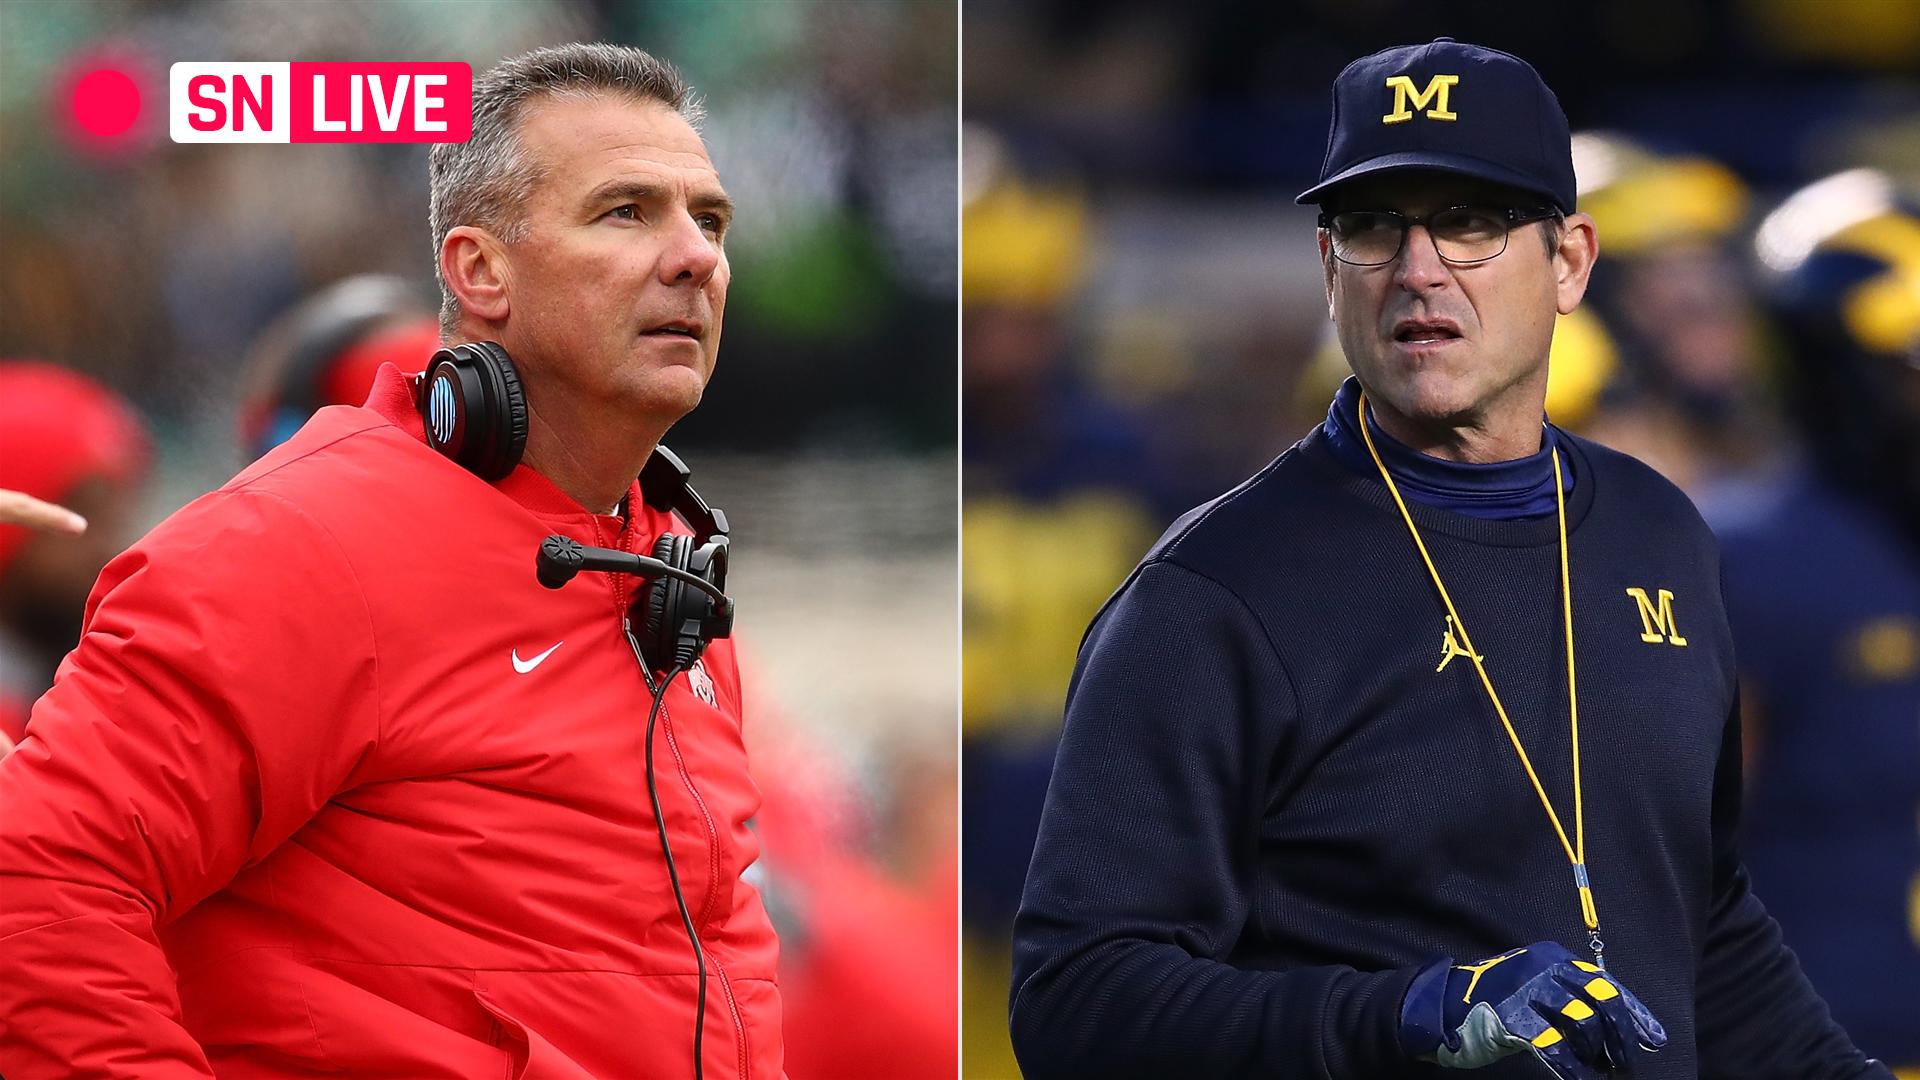 Michigan vs. Ohio State results: Buckeyes dominate Jim Harbaugh, Wolverines again